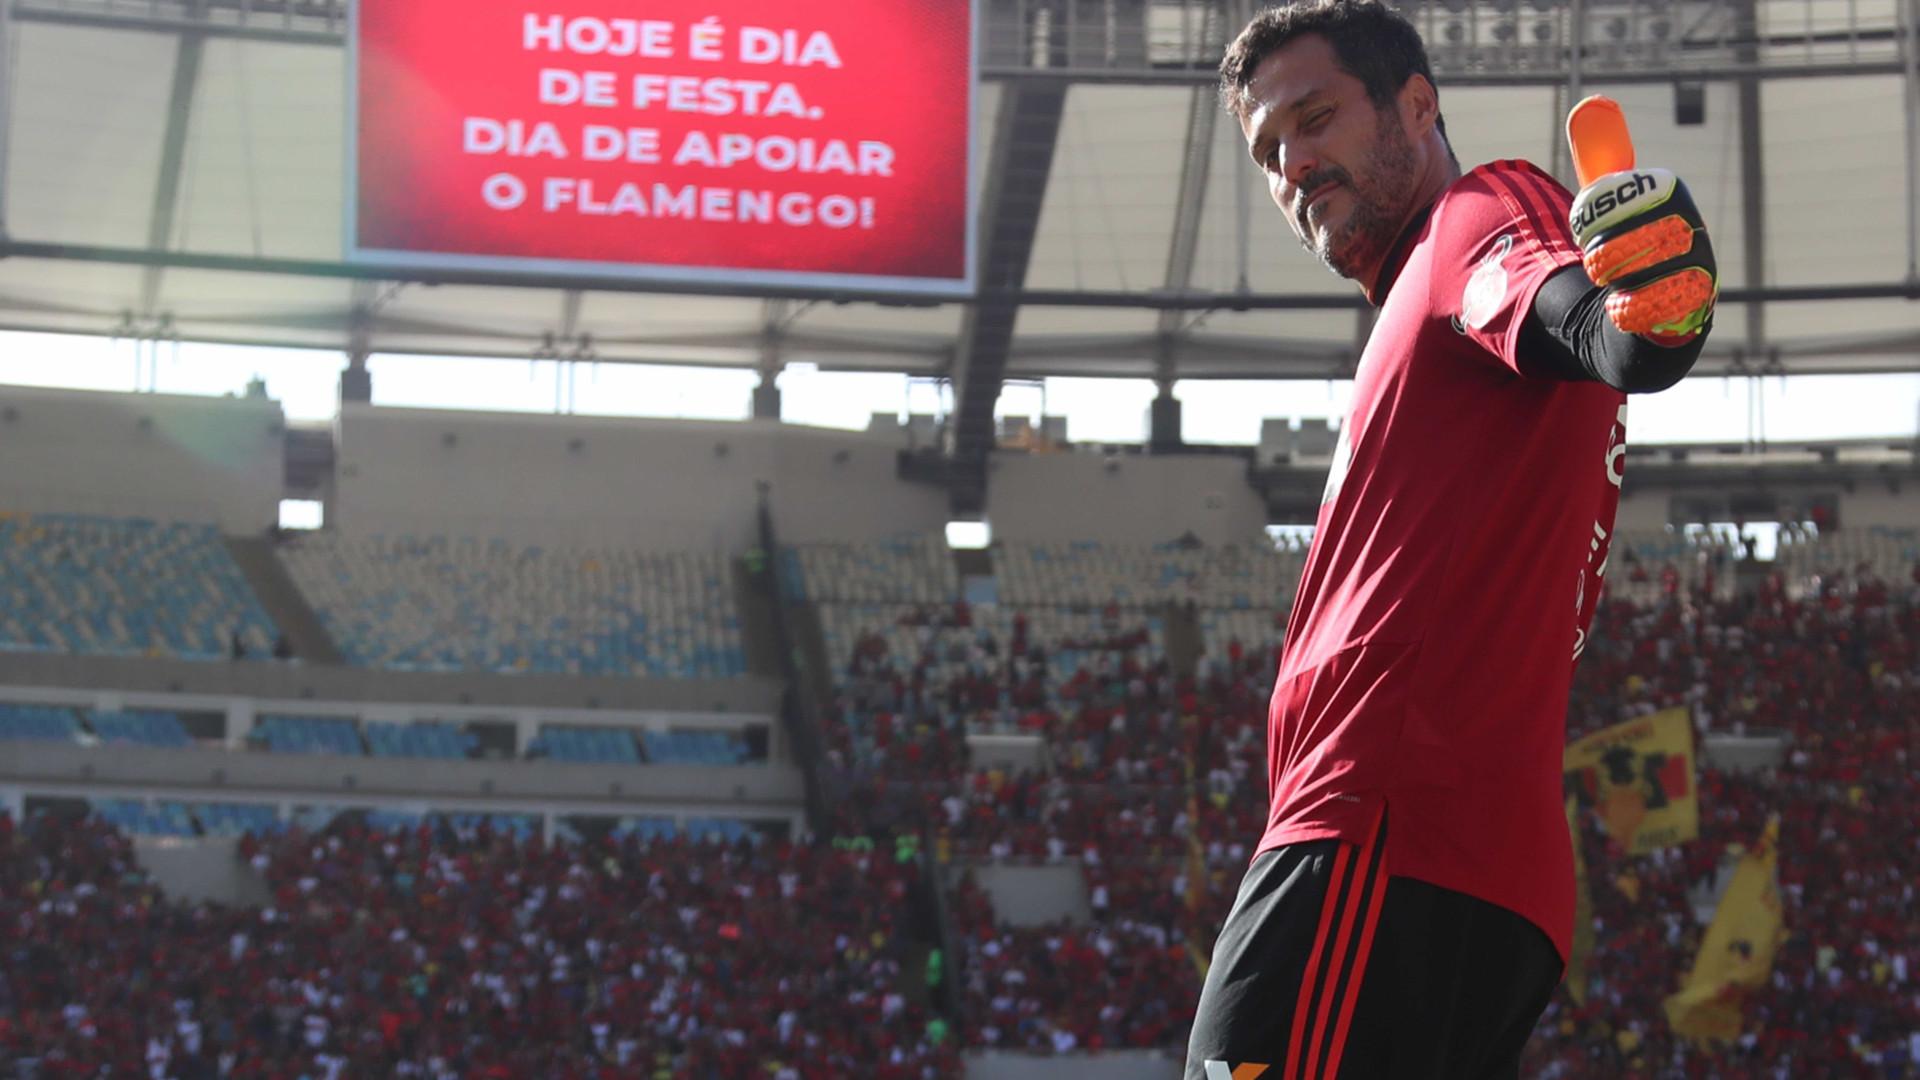 Goleiro Julio Cesar será comentarista de TV na Copa do Mundo